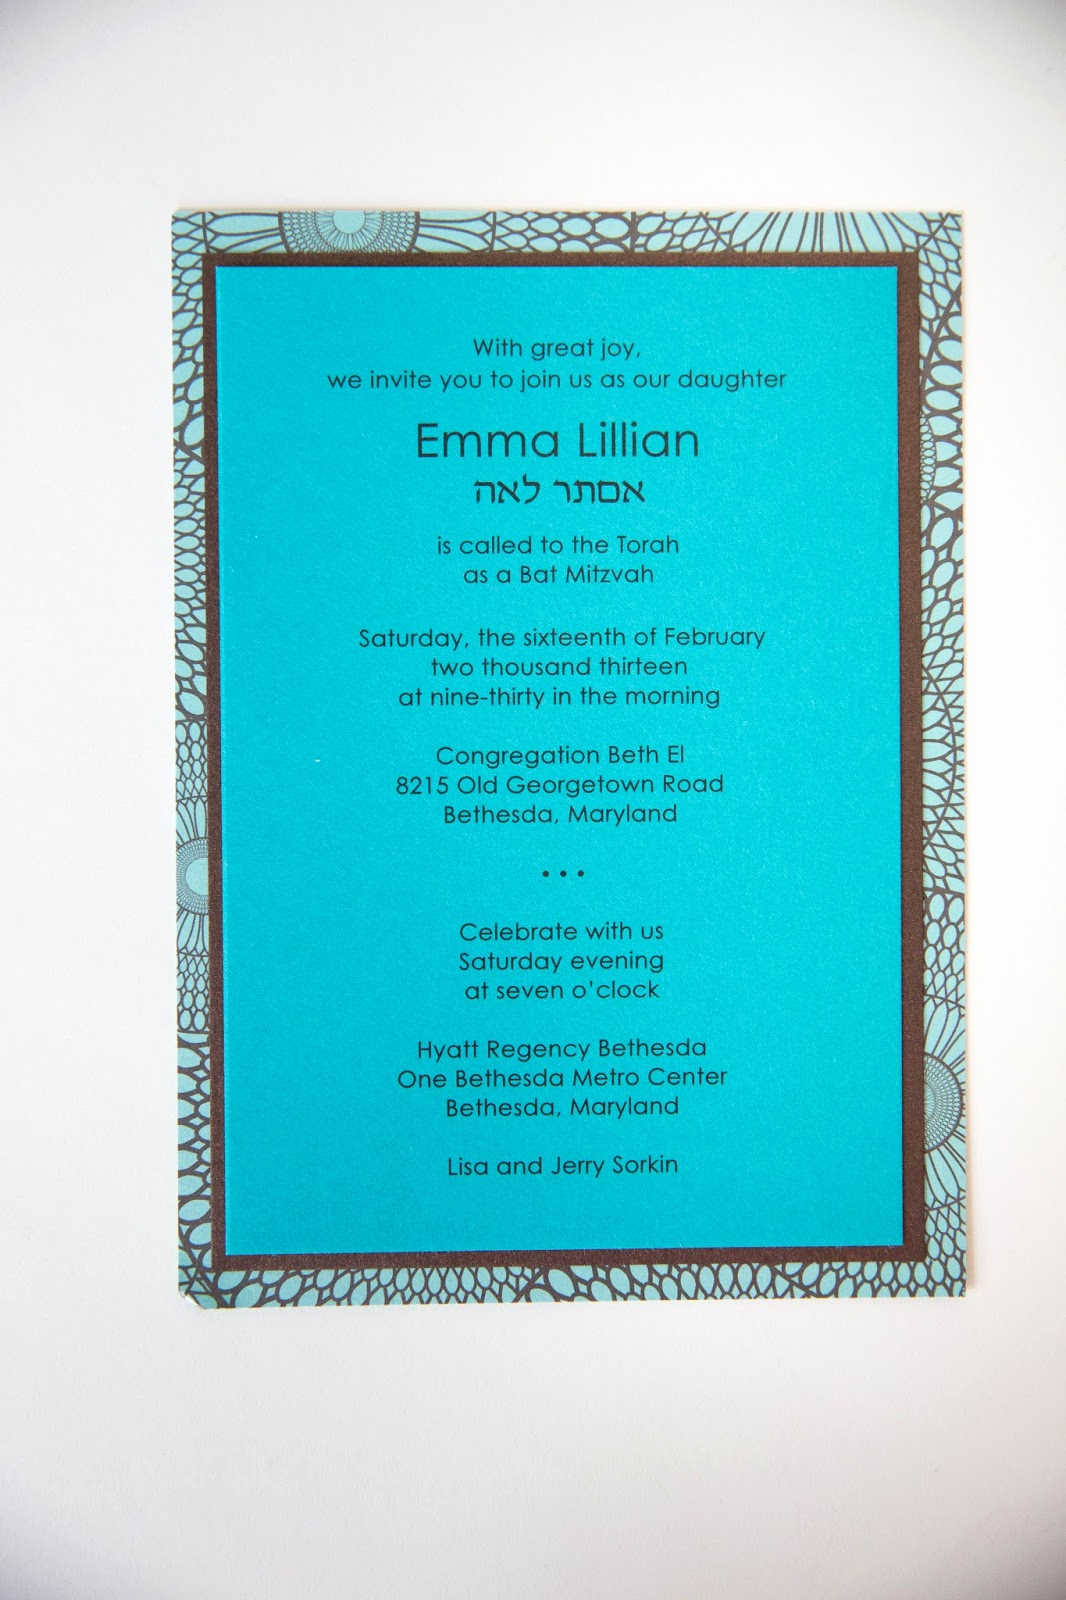 Bat Mitzvah Invitation Wording Luxury Kindly R S V P Designs Blog June 2013